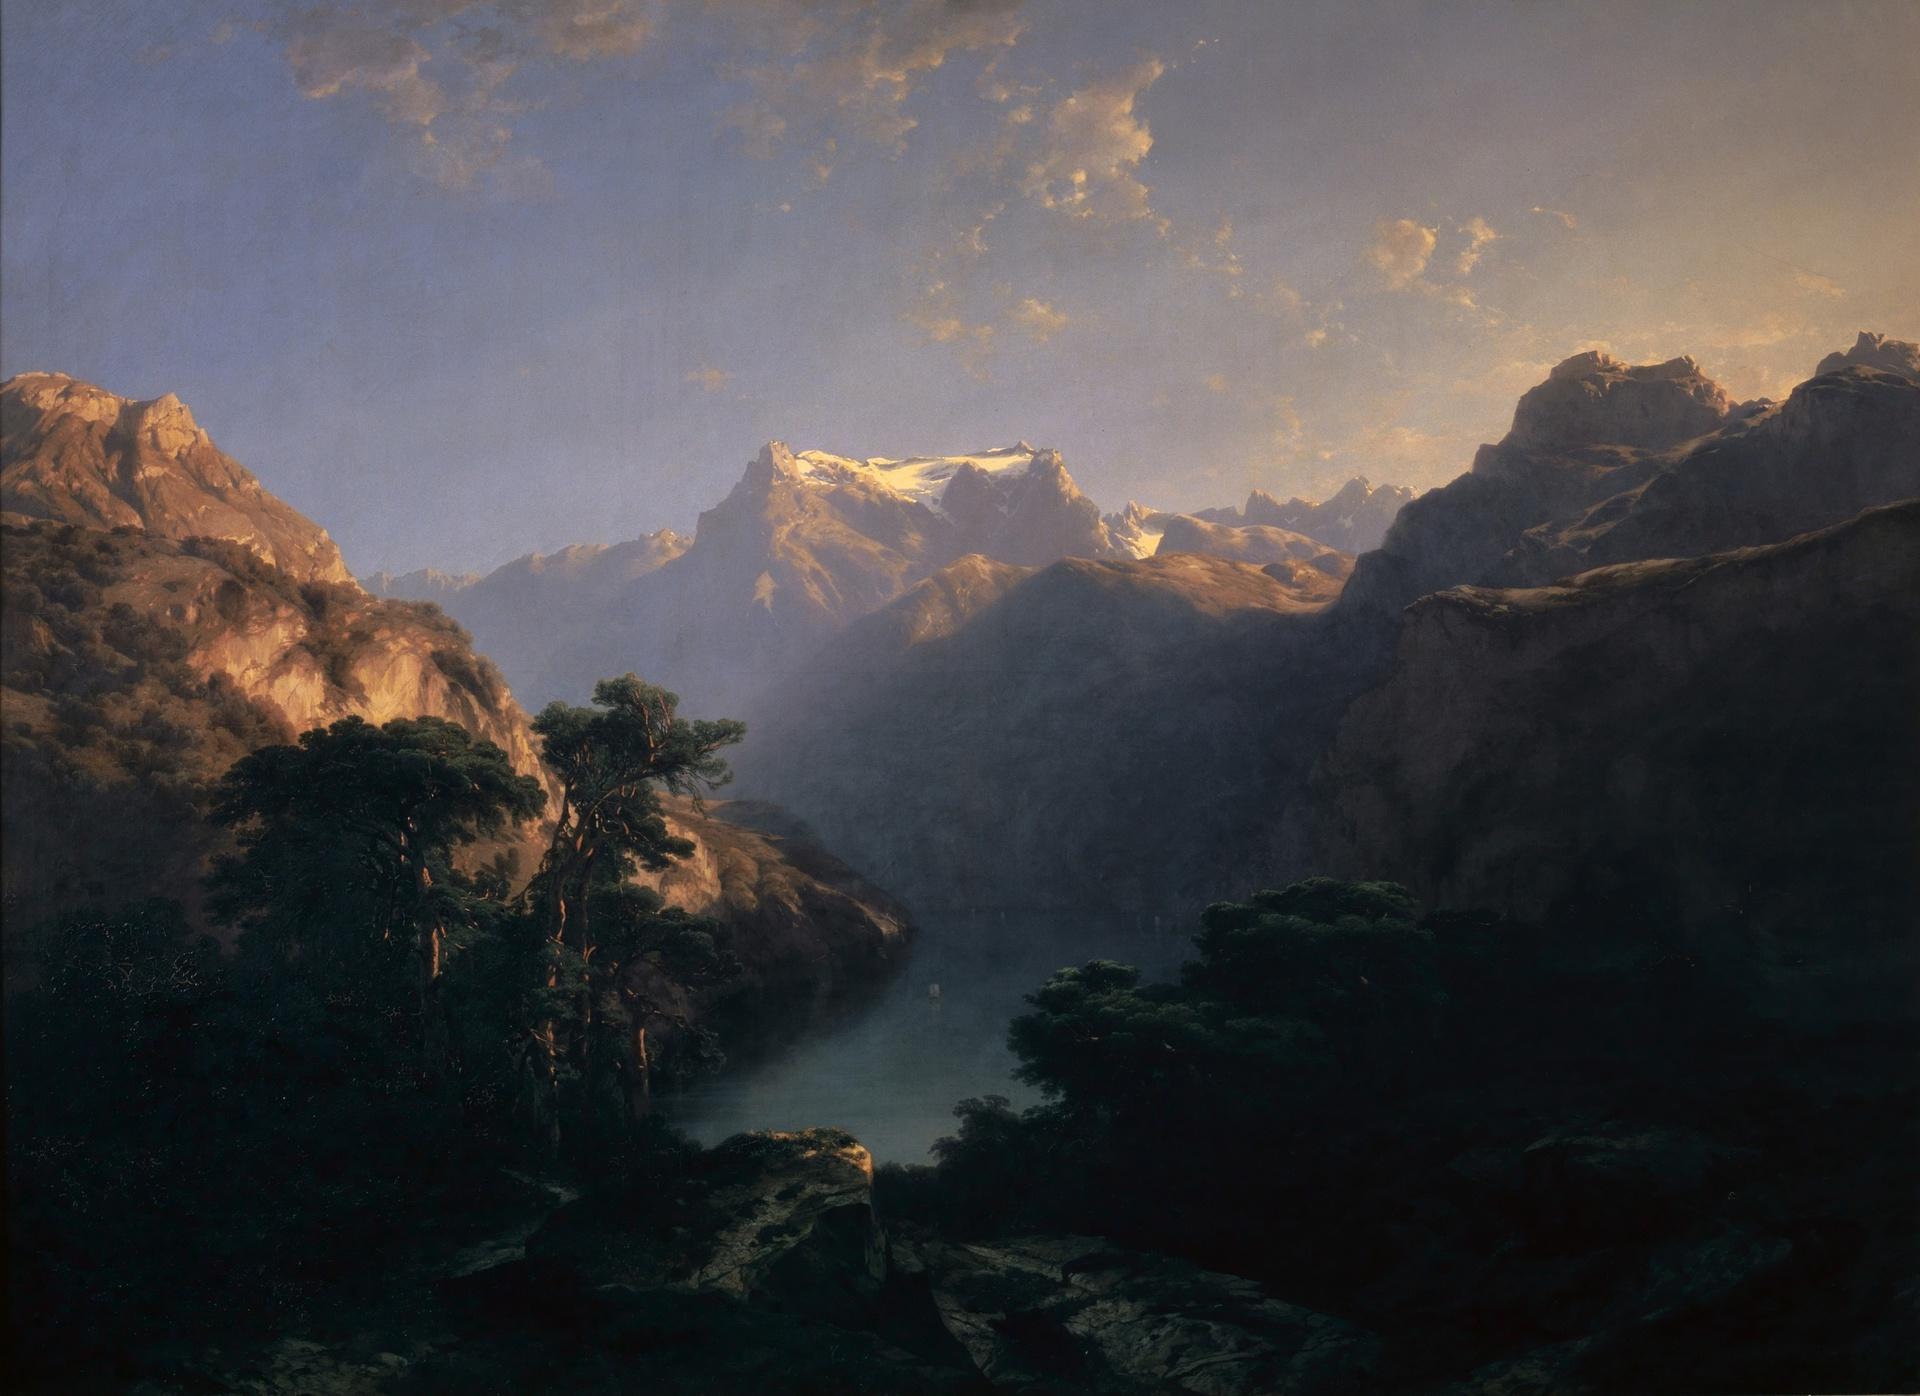 Alexandre Calame, Am Urnersee, 1849</br>Kunstmuseum Basel, Geschenk der Erben von Marie Vischer-d'Assonleville 1950